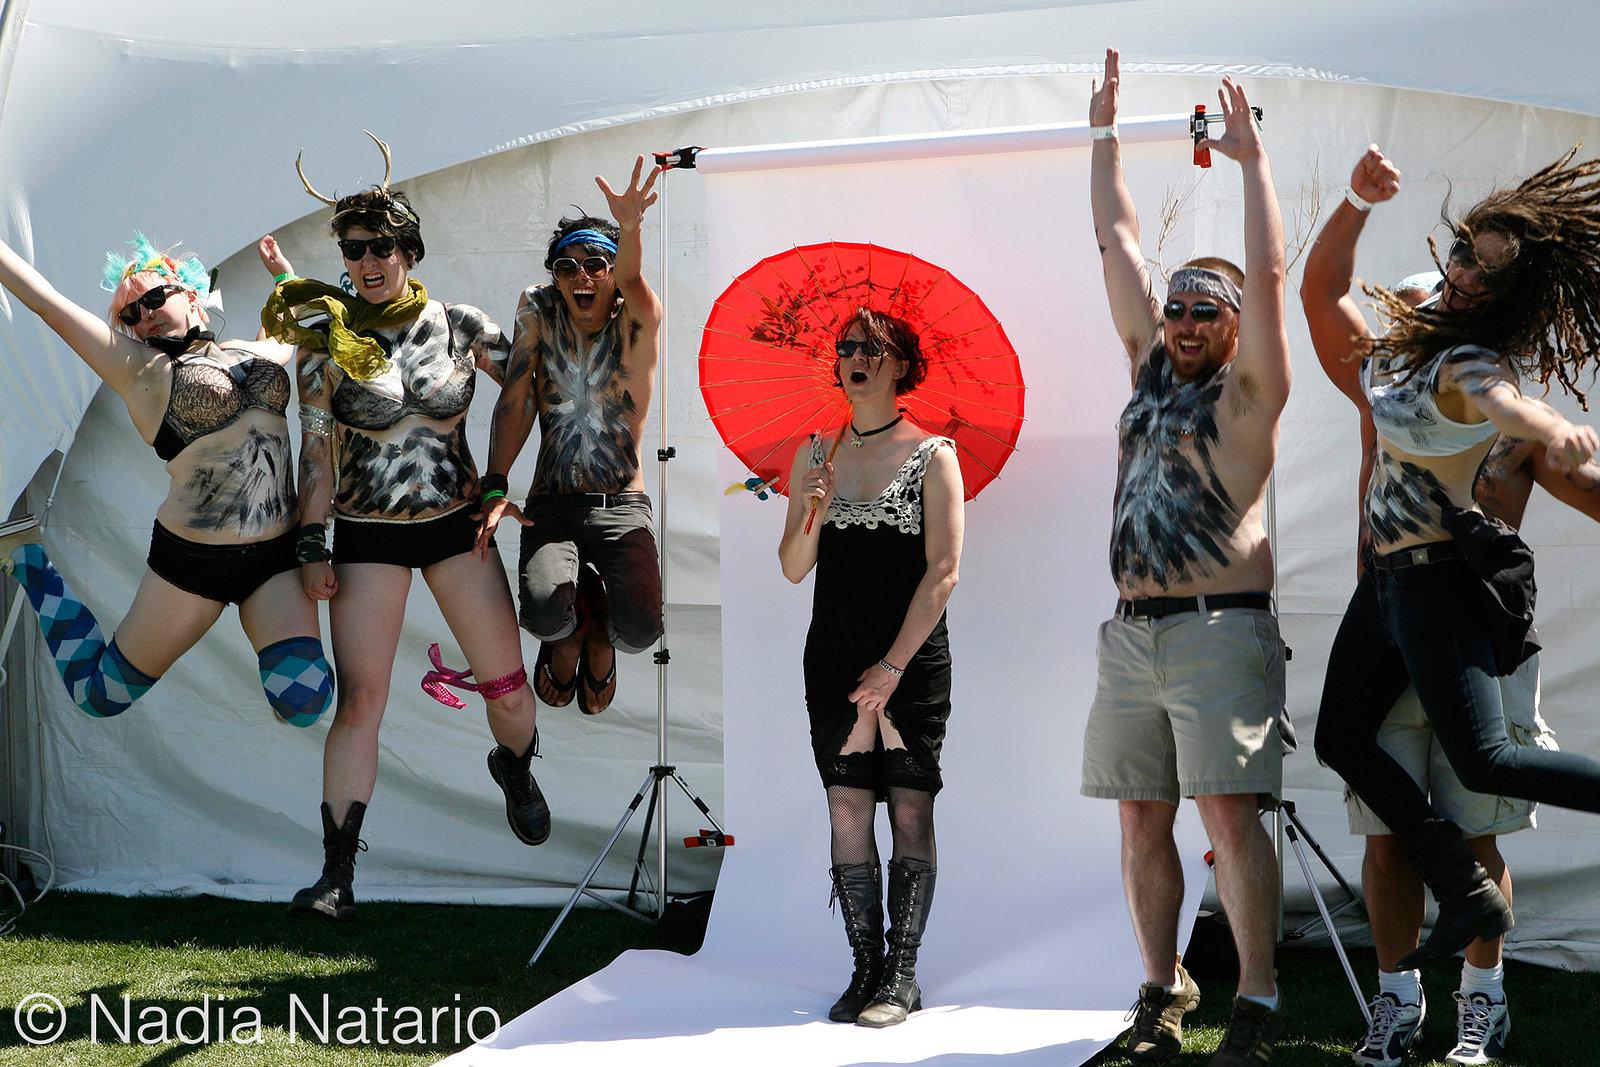 Behind The Scenes of Amanda Palmer LA Times Photo Shoot at Coachella 2009